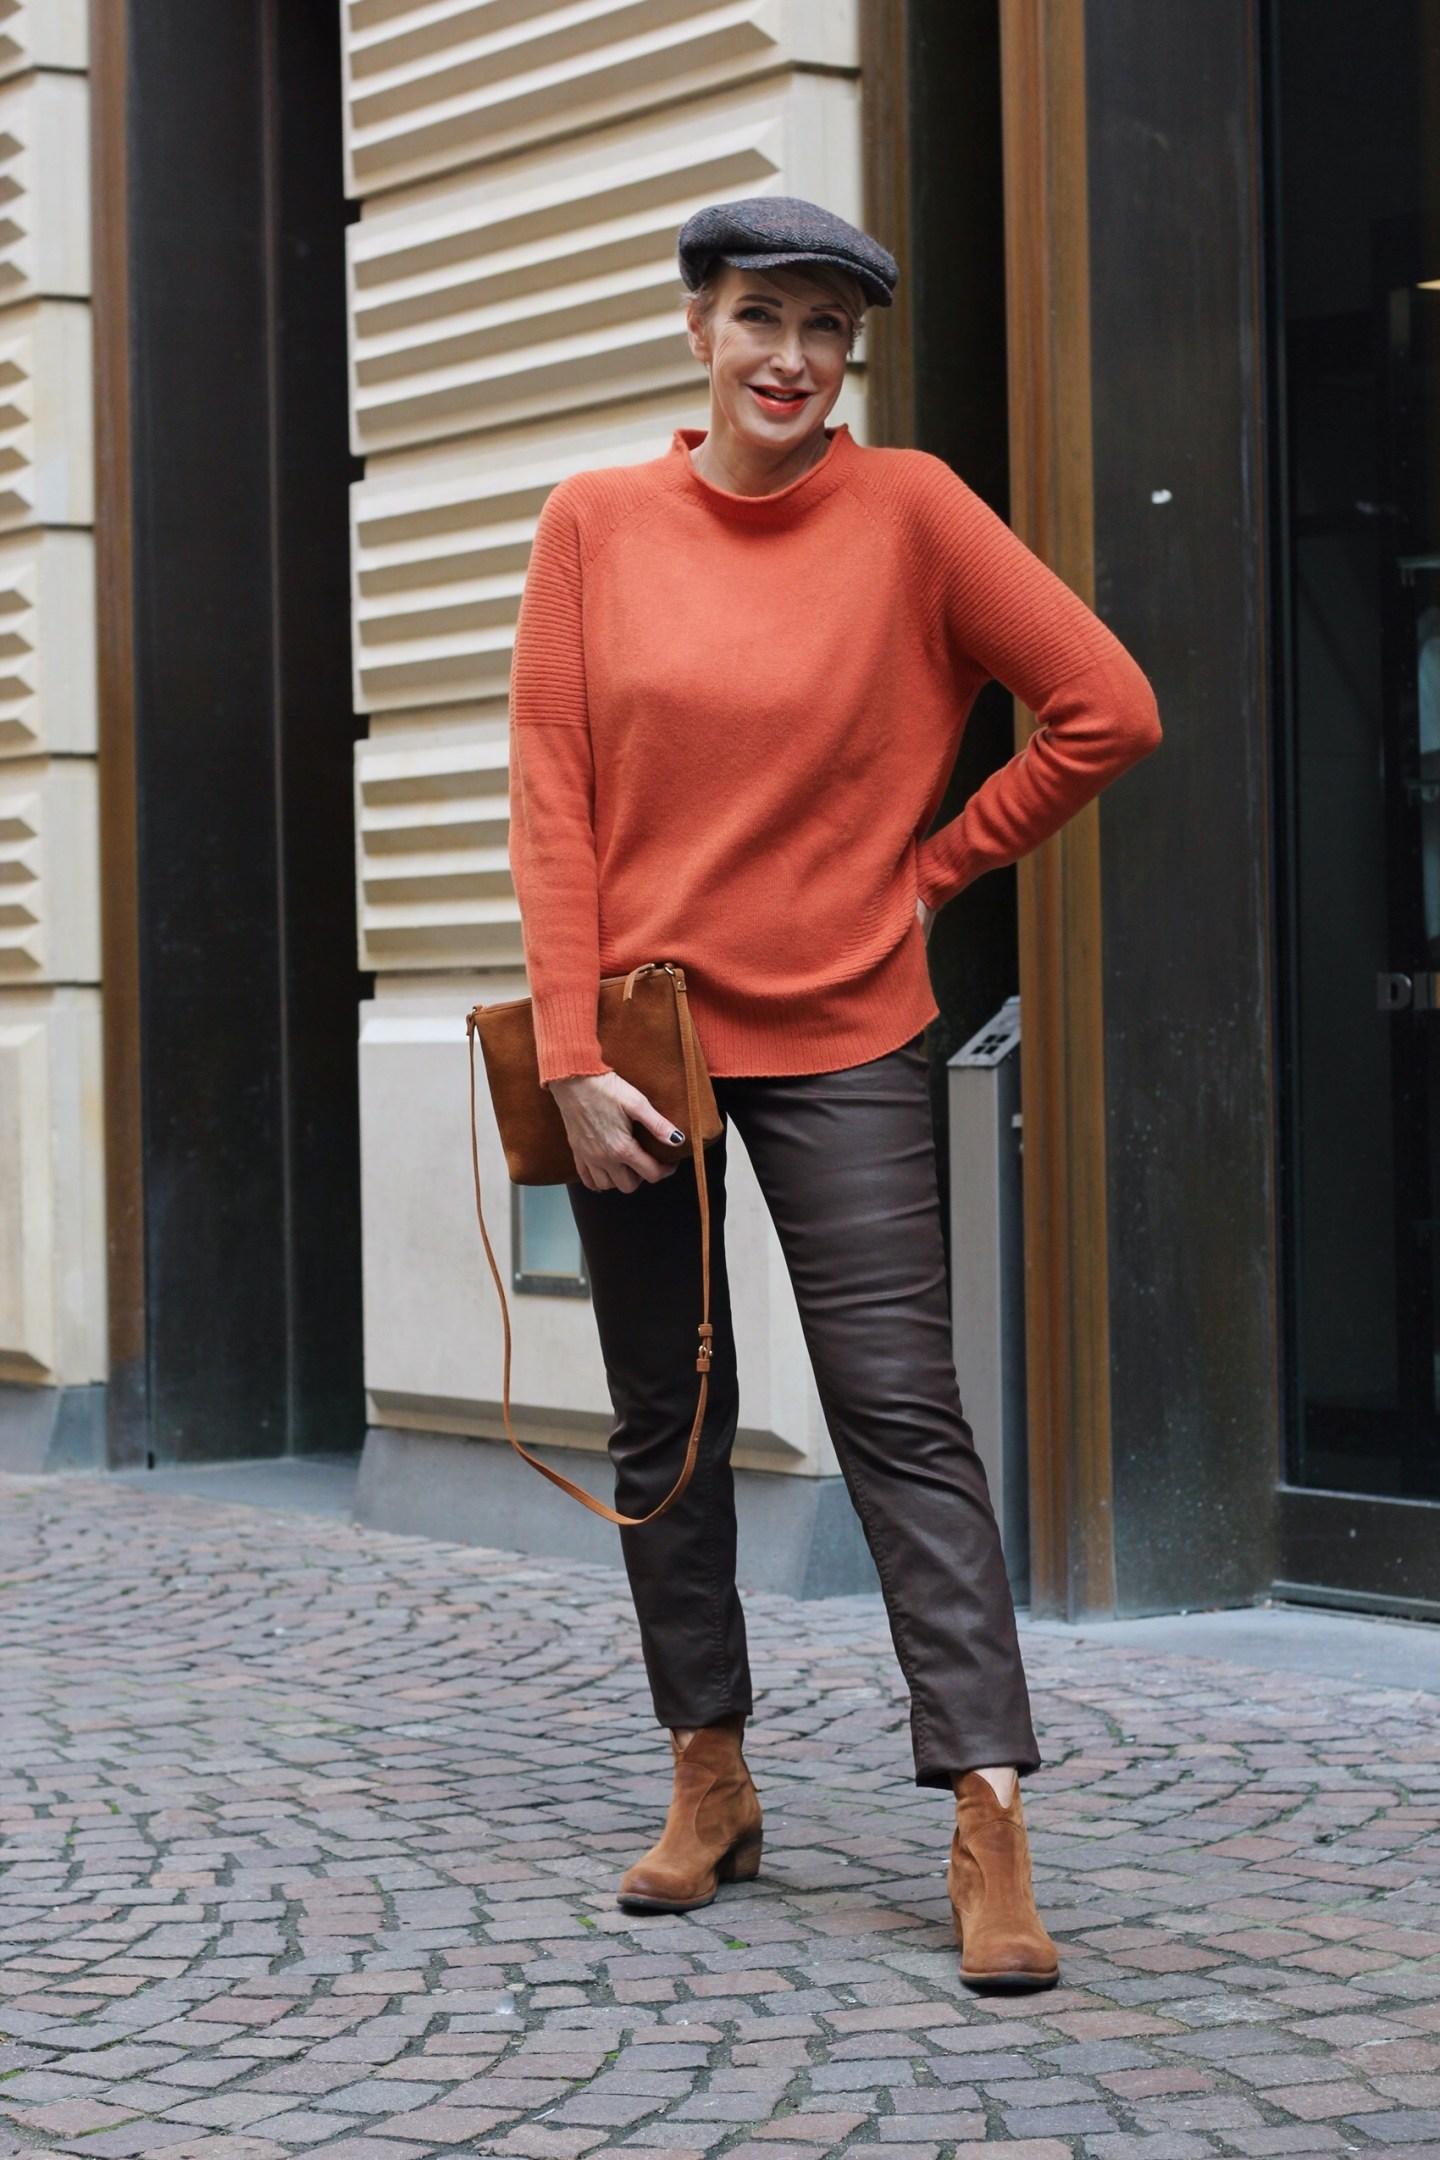 glamupyourlifestyle HR-Maintower ue-40-blog ue-50-mode Fashion-bloggerin